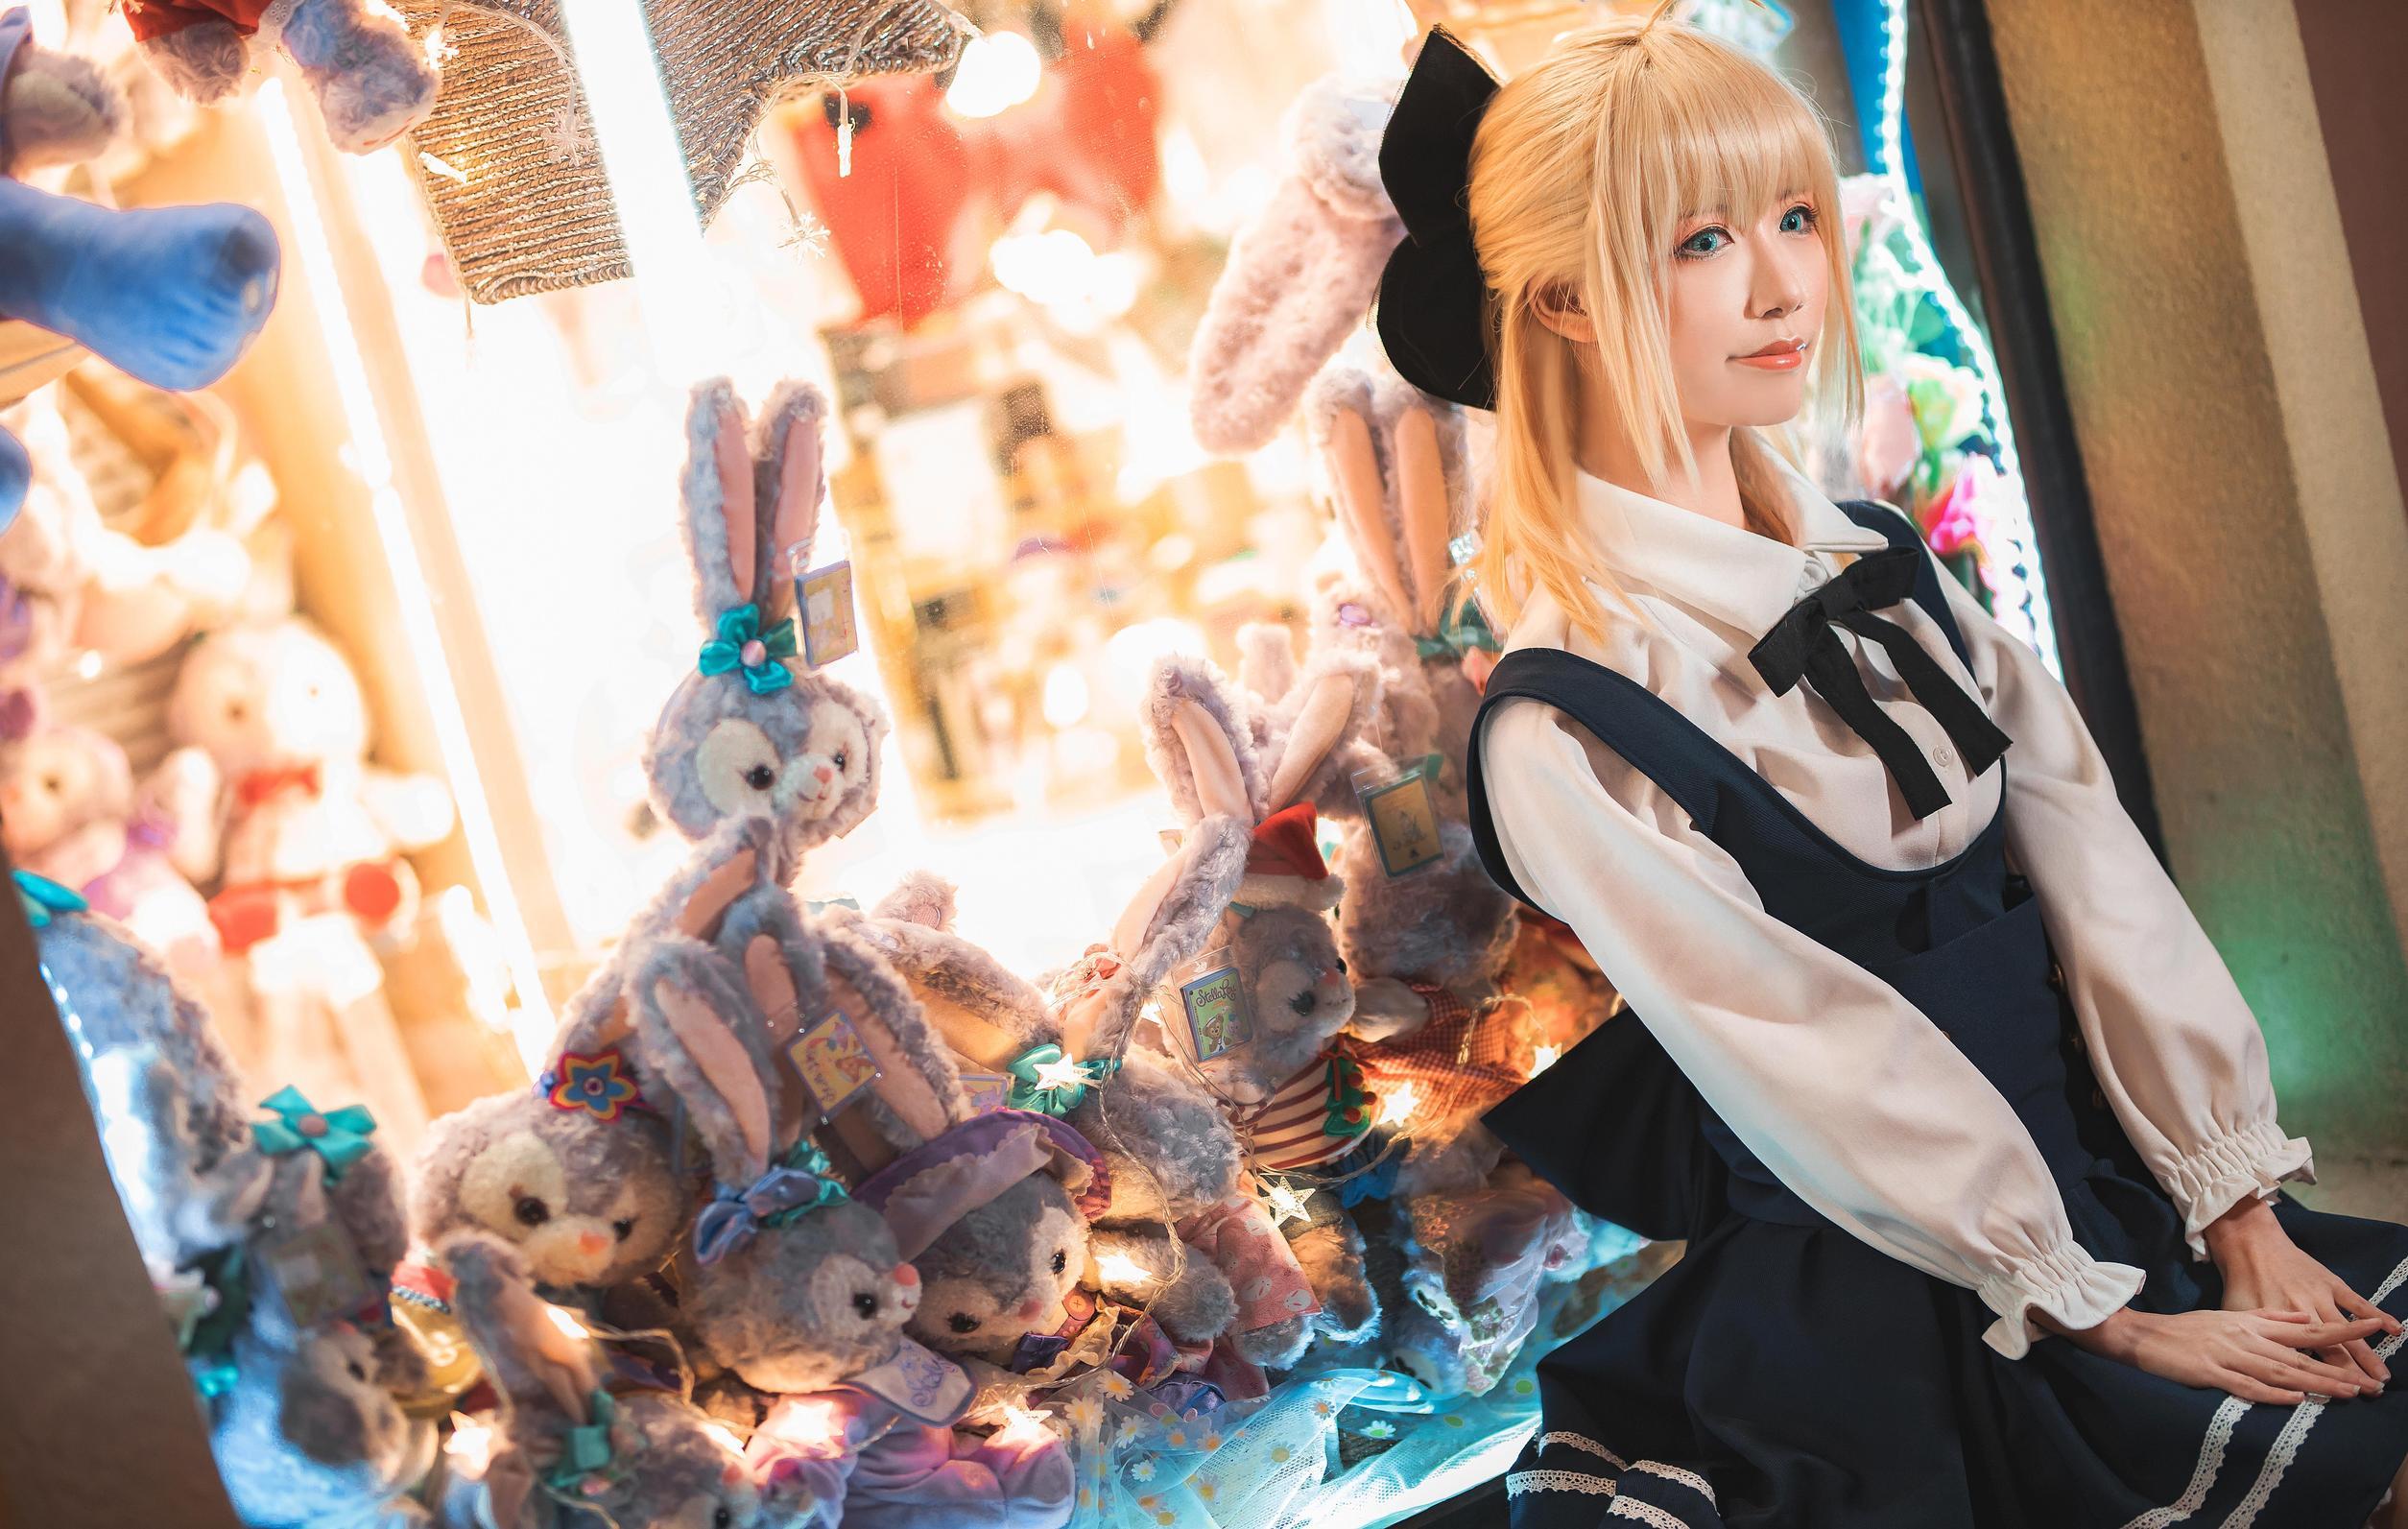 《FATE/GRAND ORDER》正片cosplay【CN:Xxyao】 -涂山雅雅真人cosplay图片插图